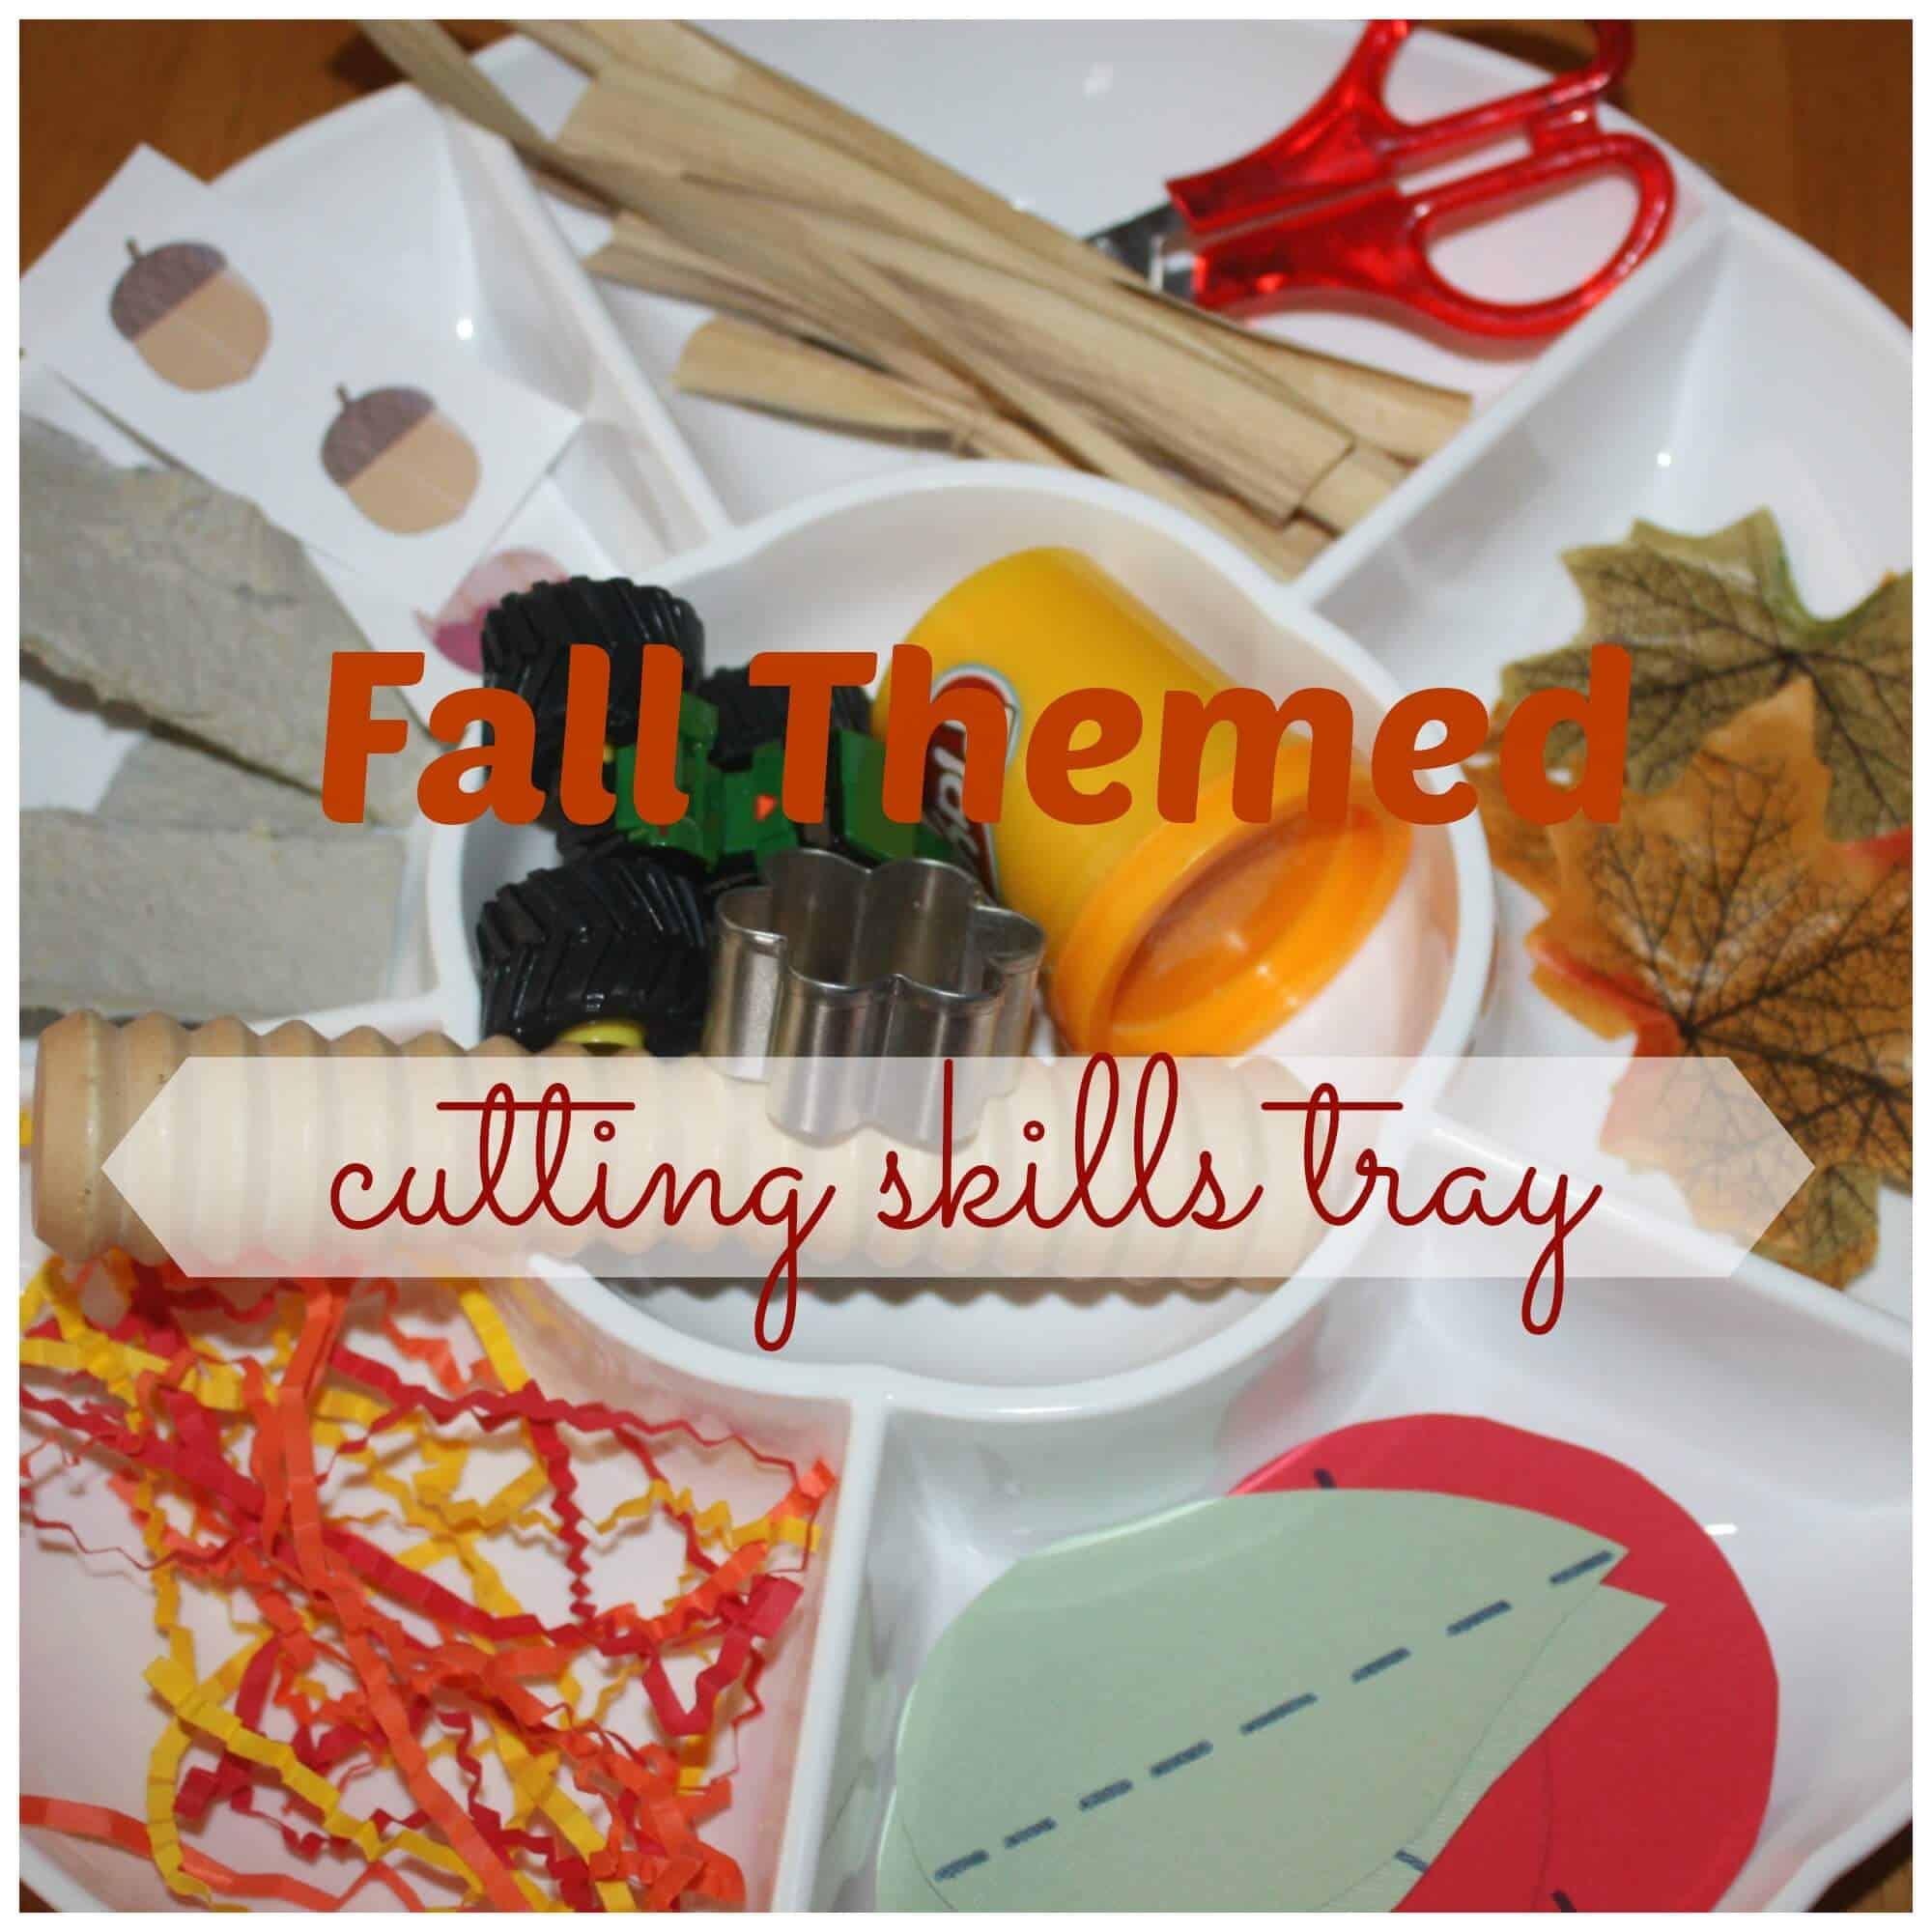 Fall Themed Cutting Skills Tray